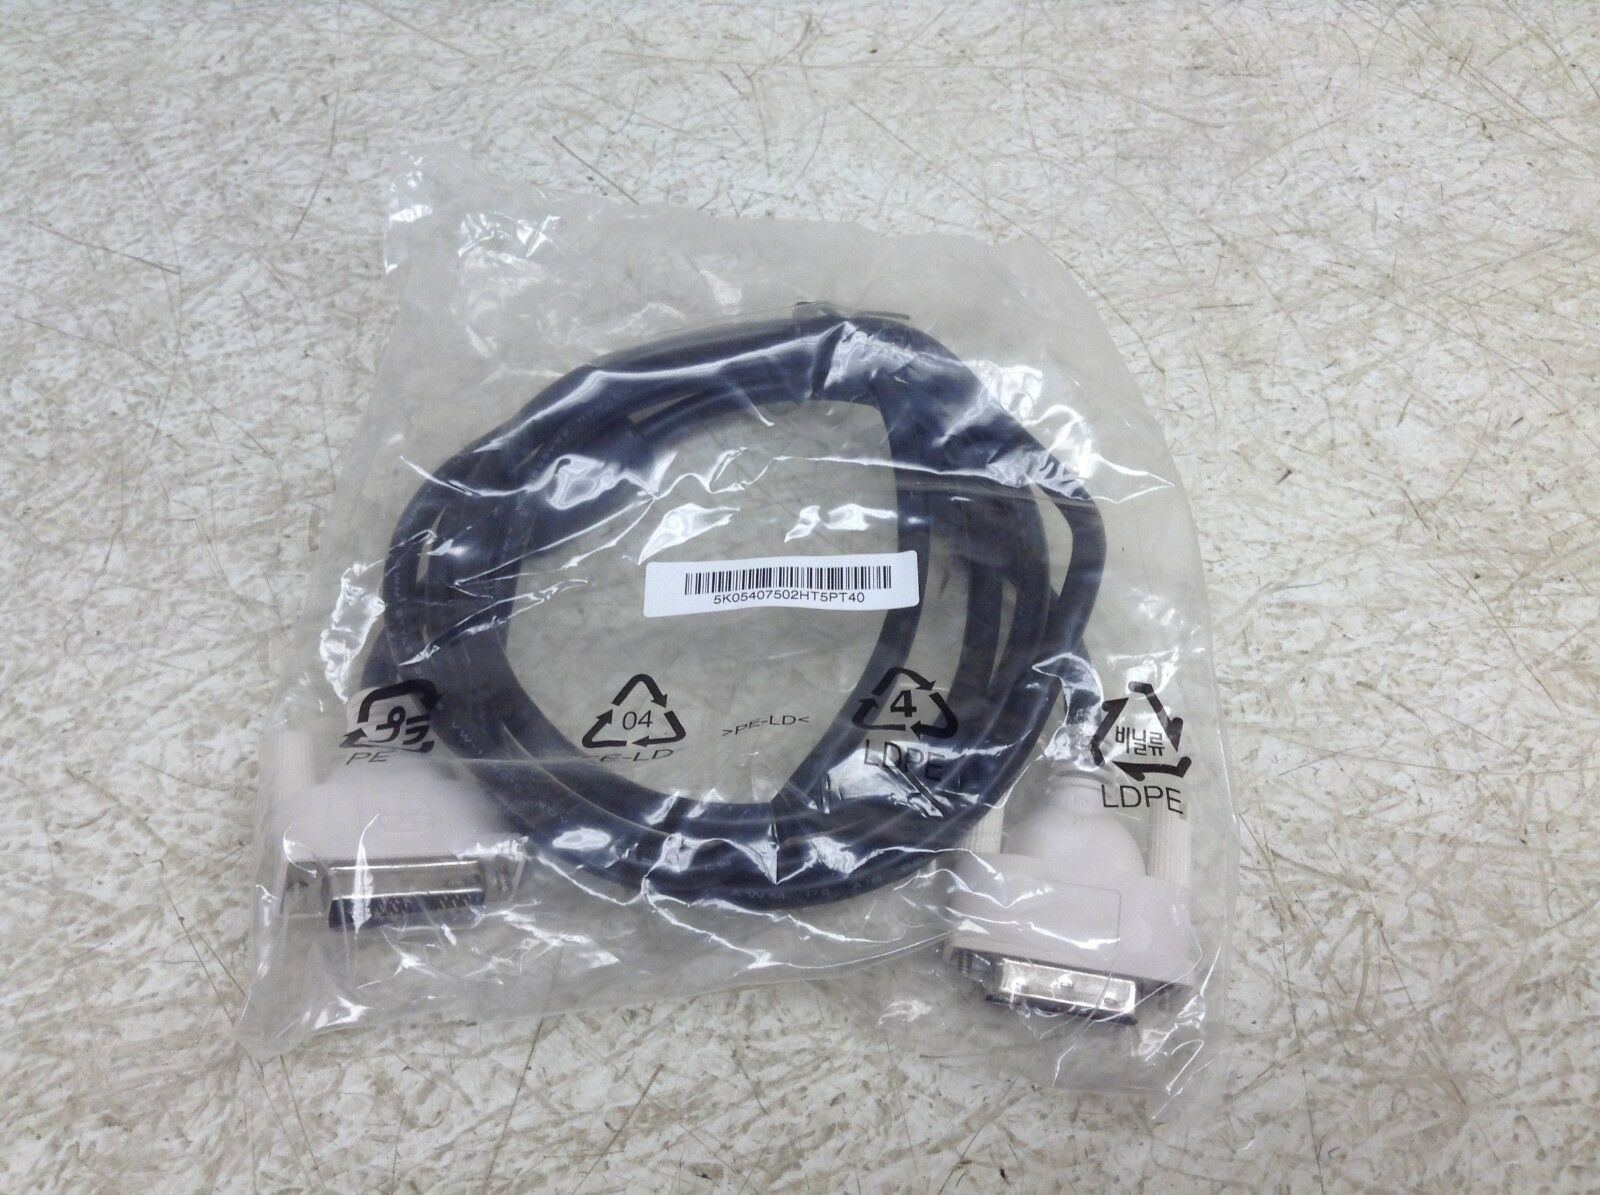 HOTRON DVI-D SINGLE LINK CABLE E246588 AWM STYLE 20276 30V VW-1 #G6